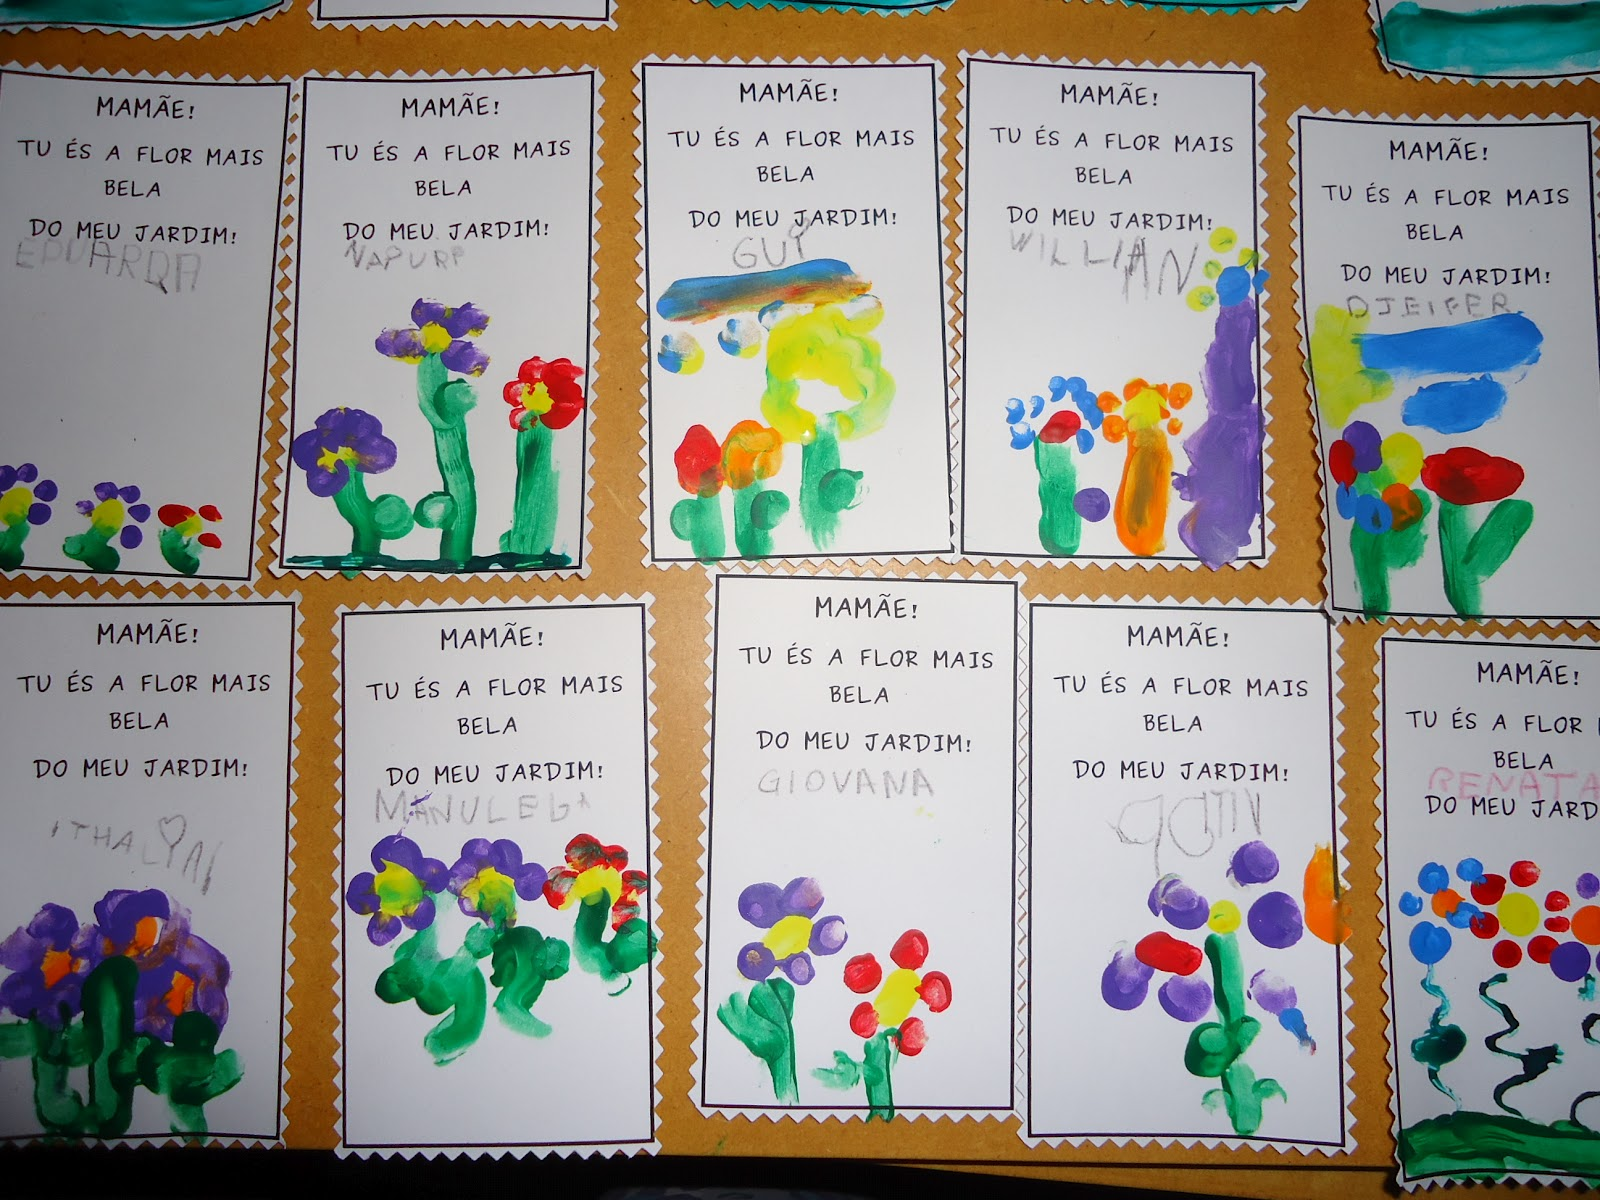 flores do jardim letra : flores do jardim letra:JARDIM: Parabéns Mamãe!